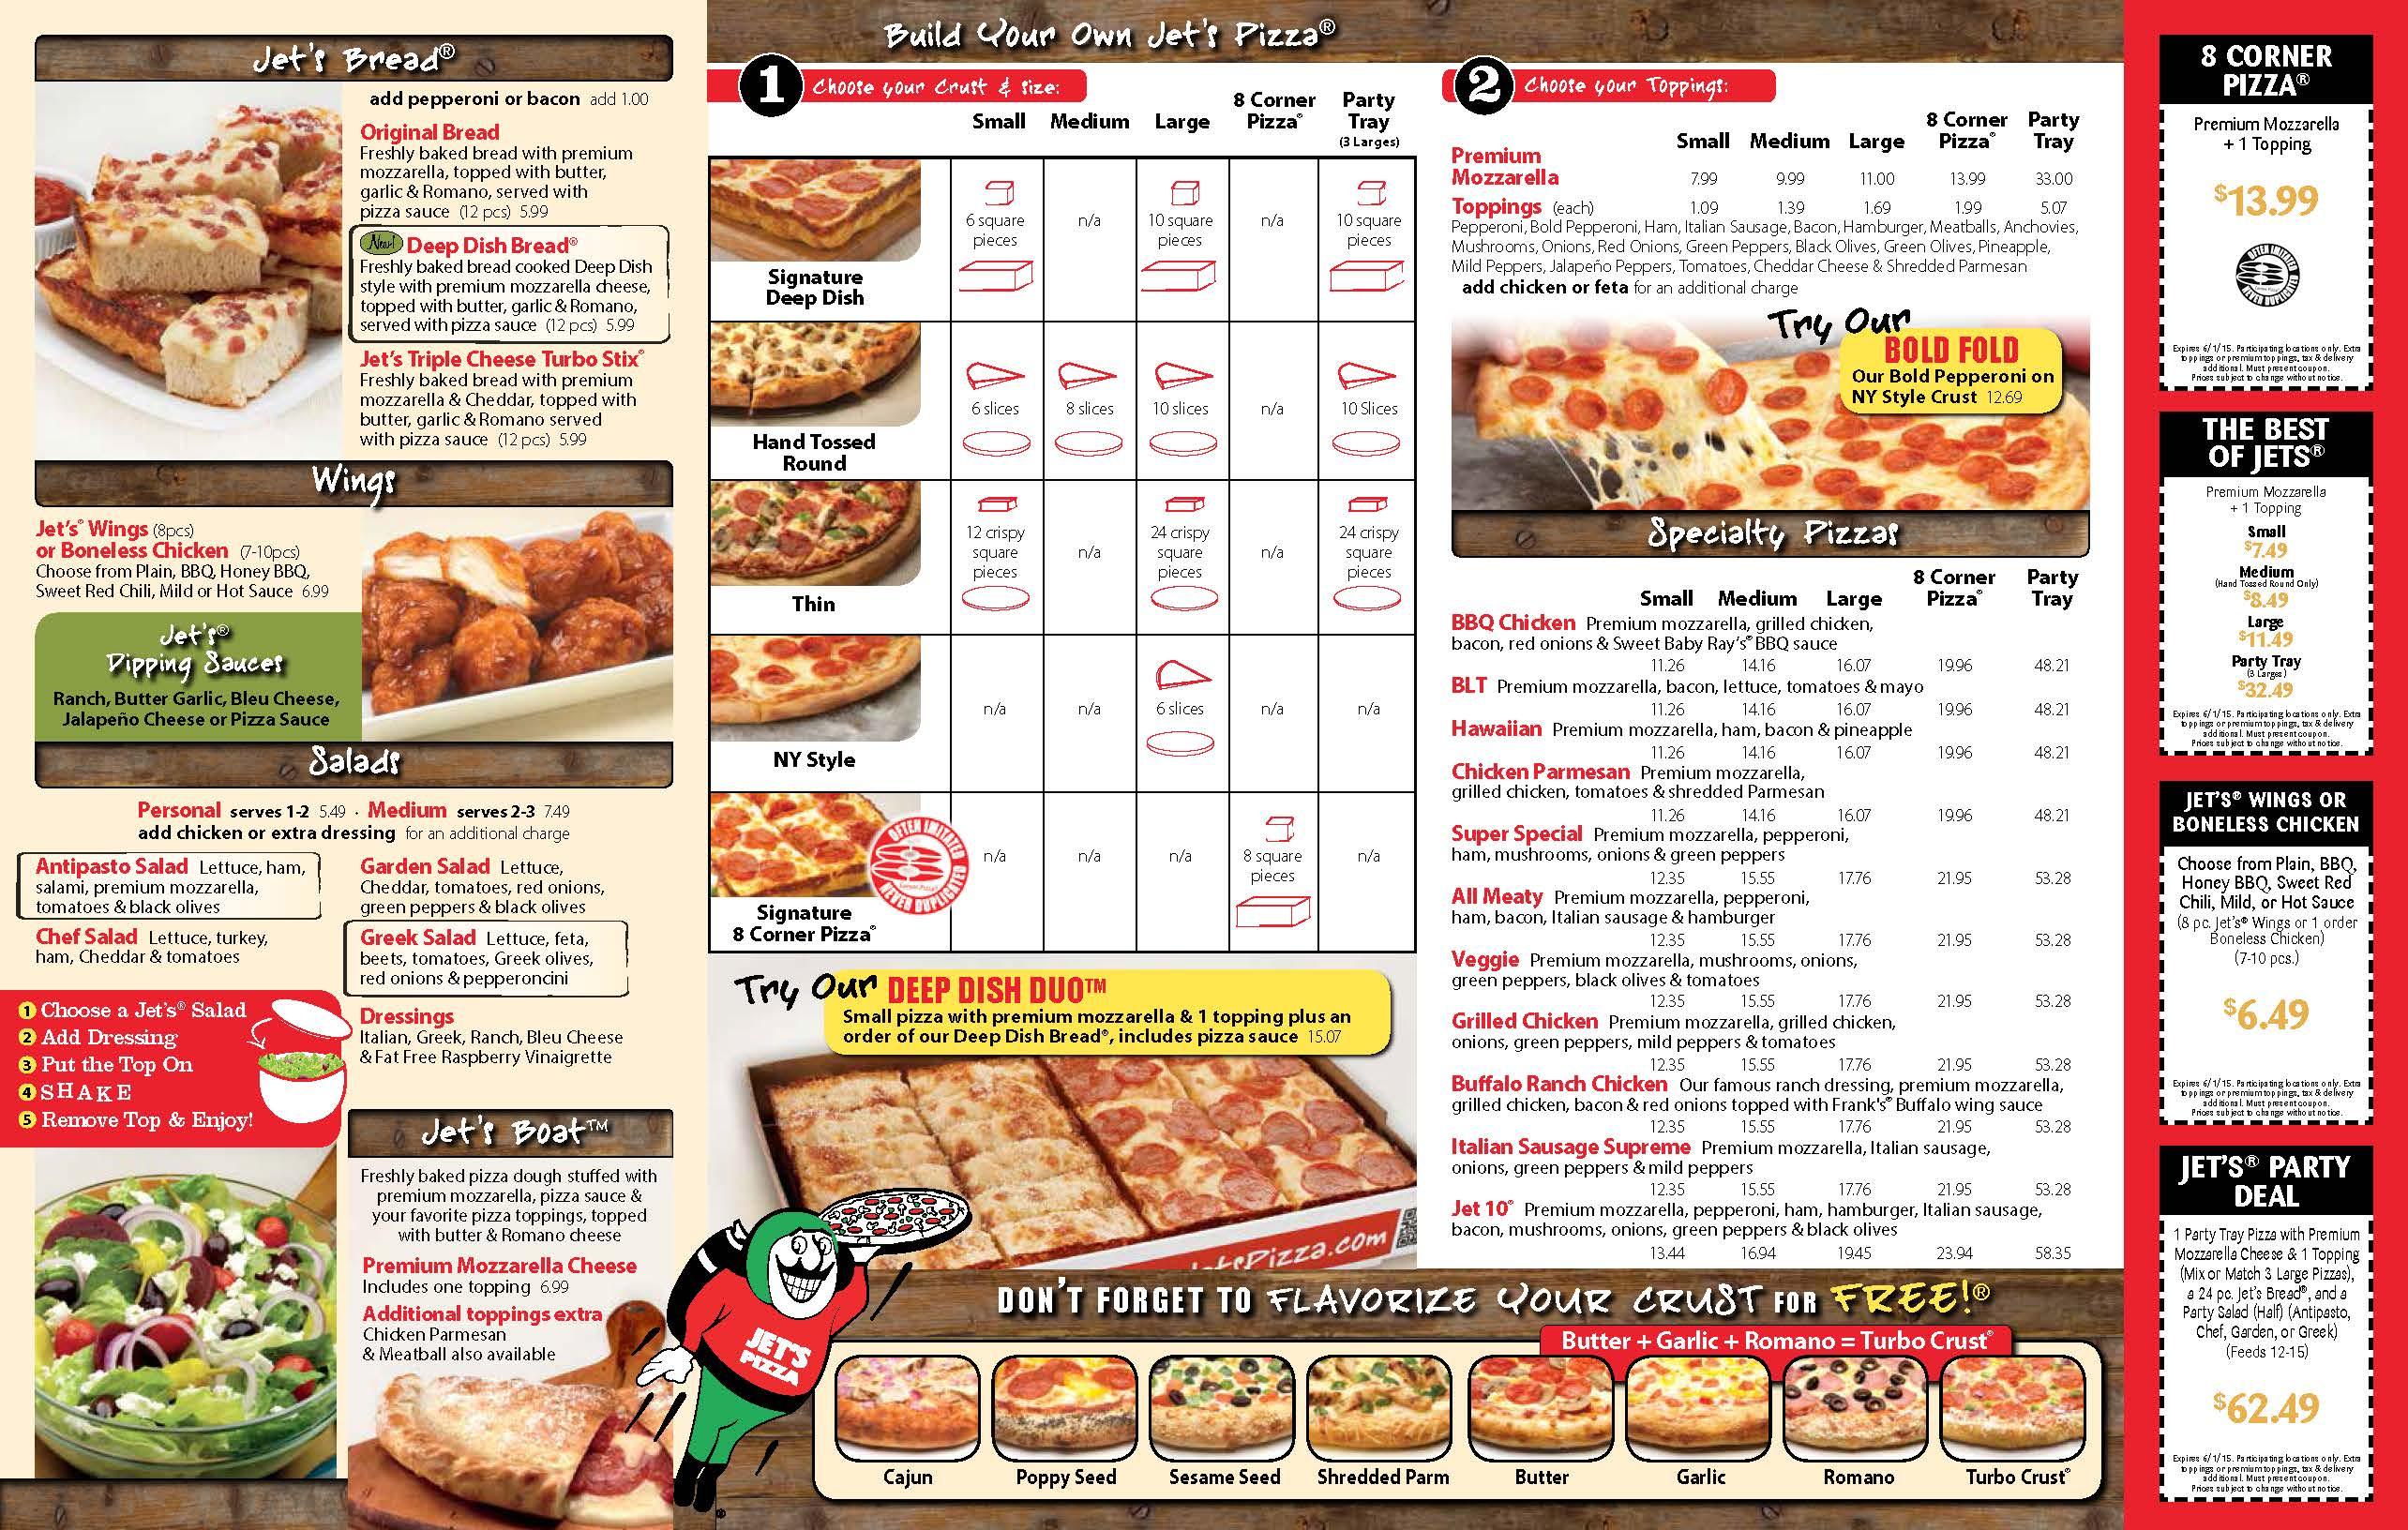 jet's pizza 24225 kuykendahl rd, tomball, tx 77375 - yp